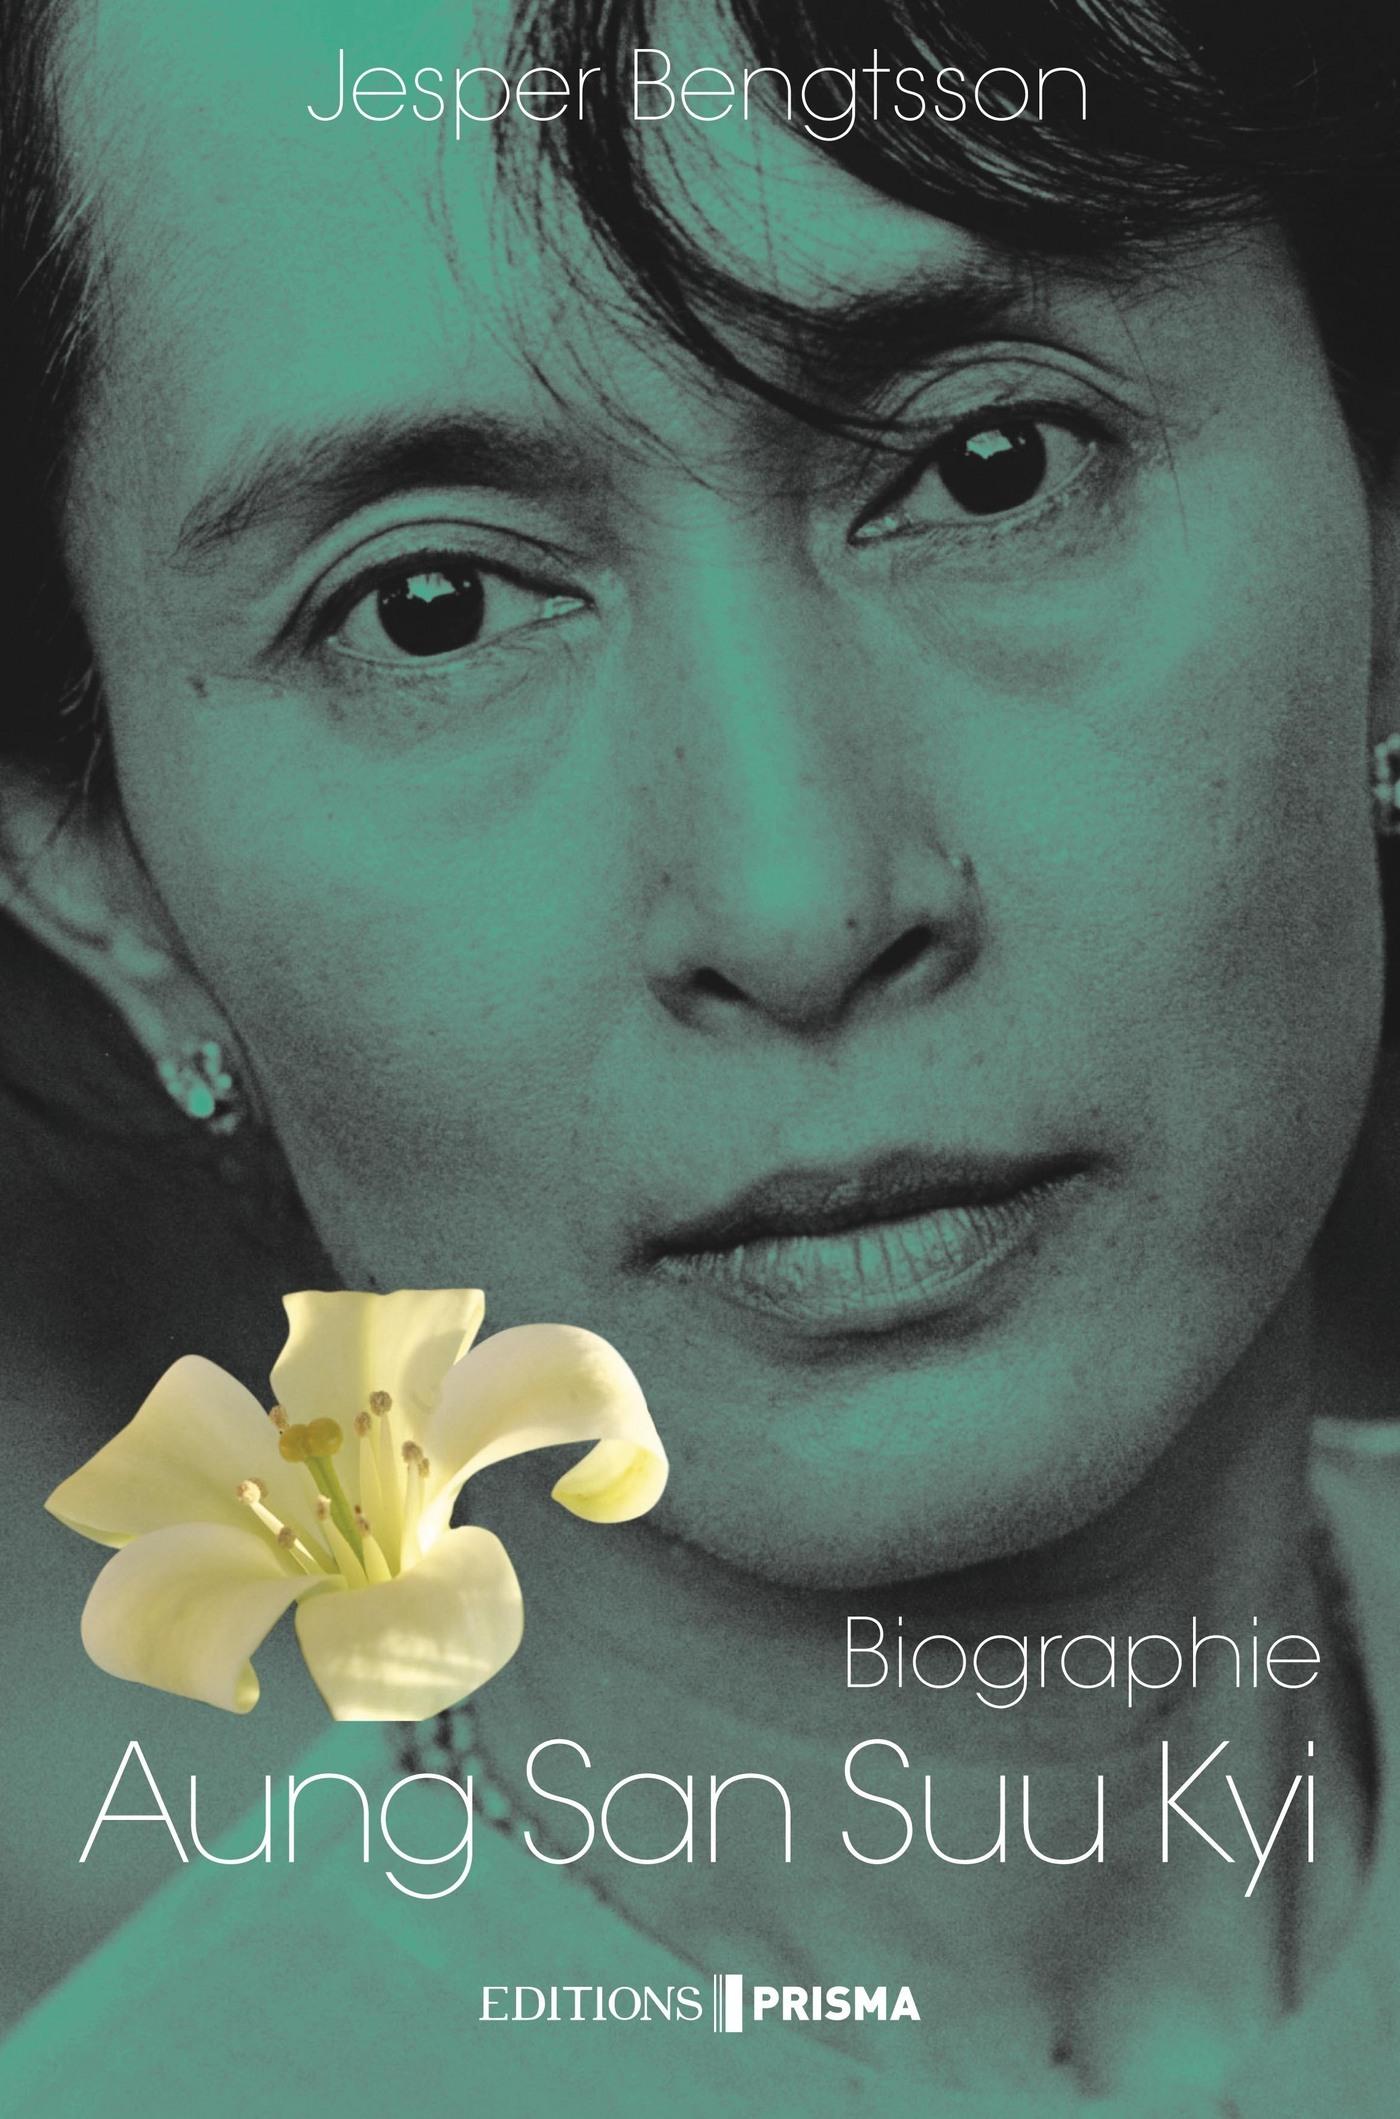 Aung San Suu Kyi Un pays, une femme, un destin (ebook)